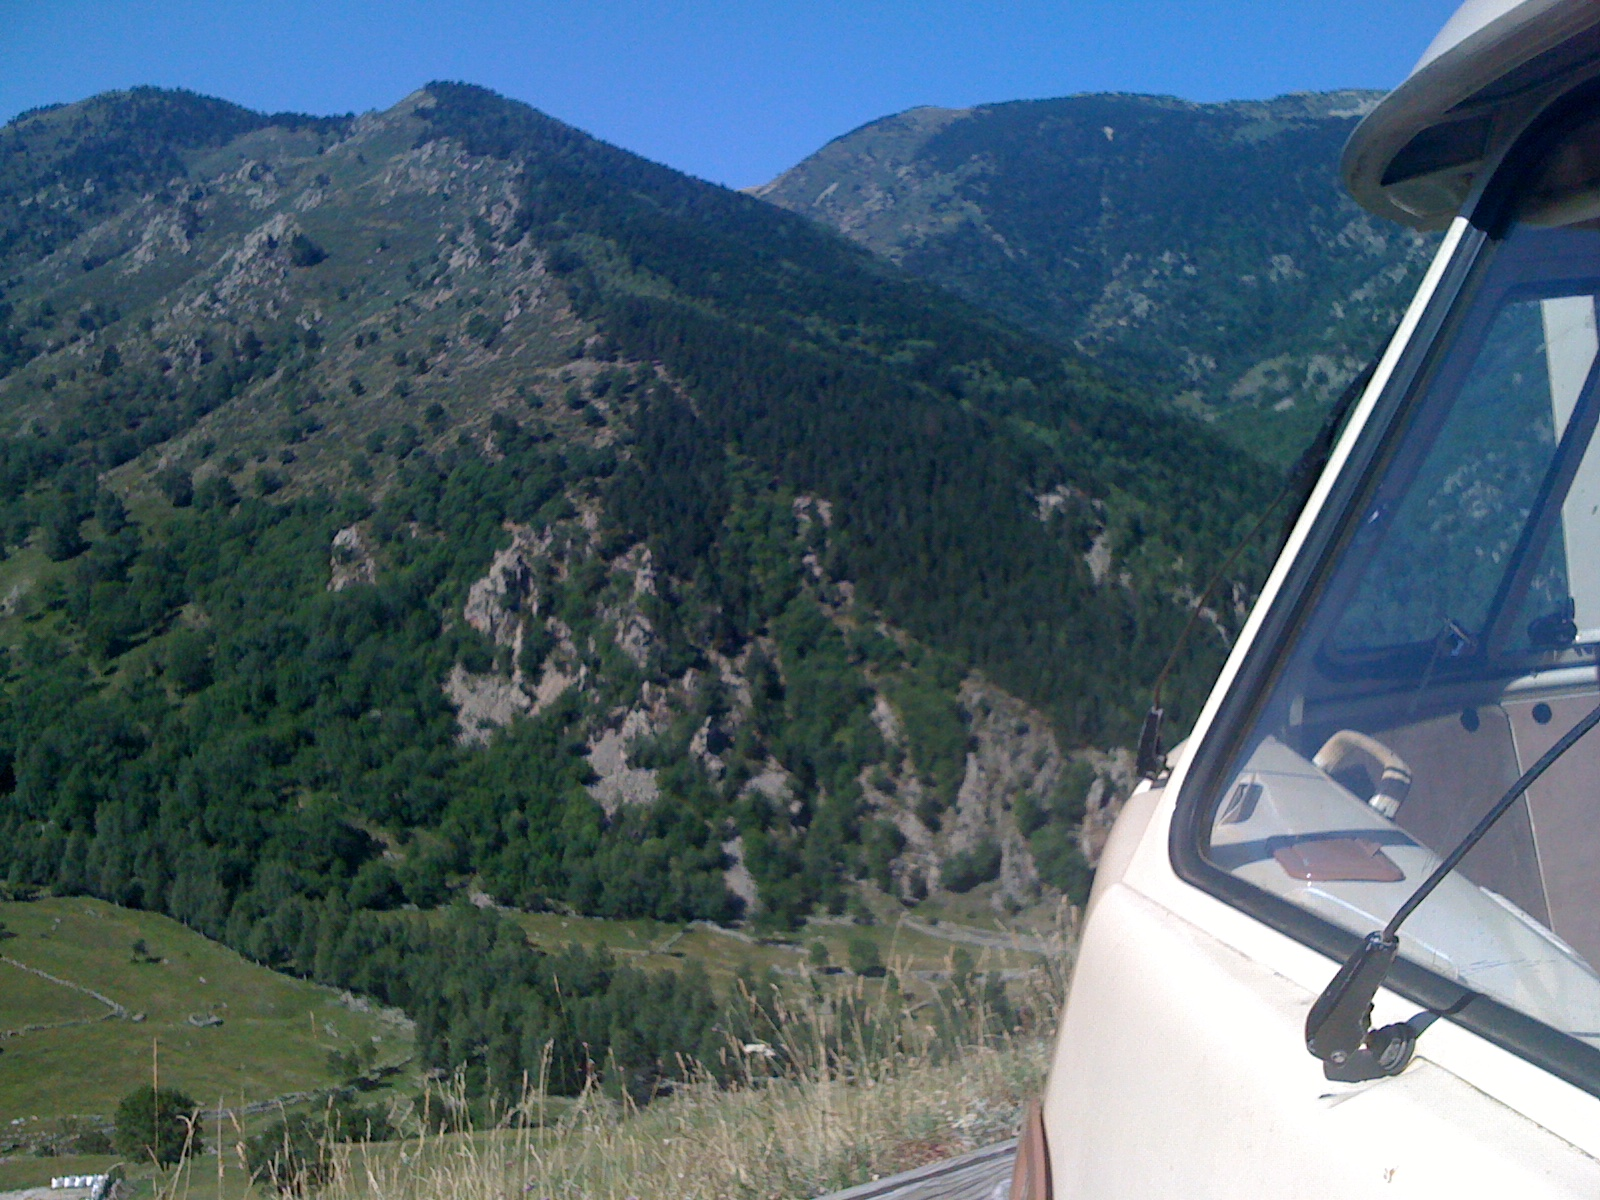 Vw combi split pyrenees 2011